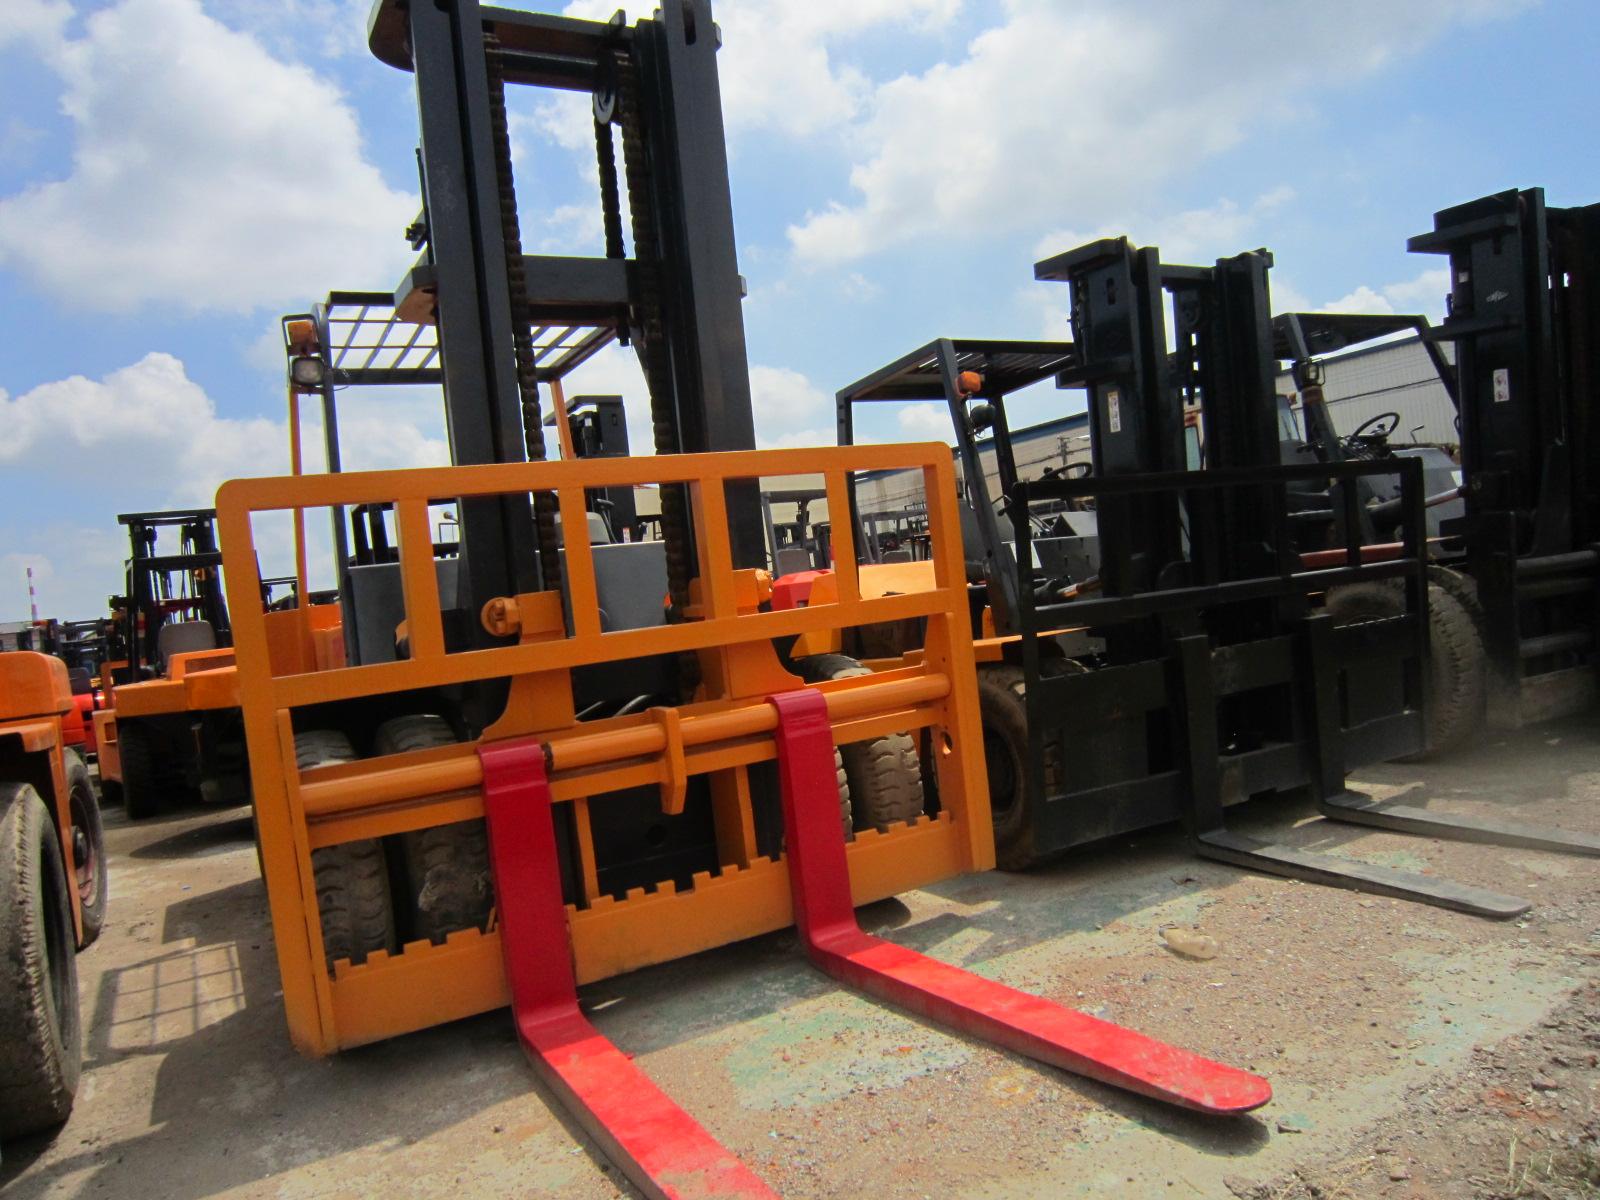 Second Hand Used 10 Ton TCM Forklift Japan Made Used KoMatsu Tcm 25t 3t 5t 6t 10t 20t Forklift